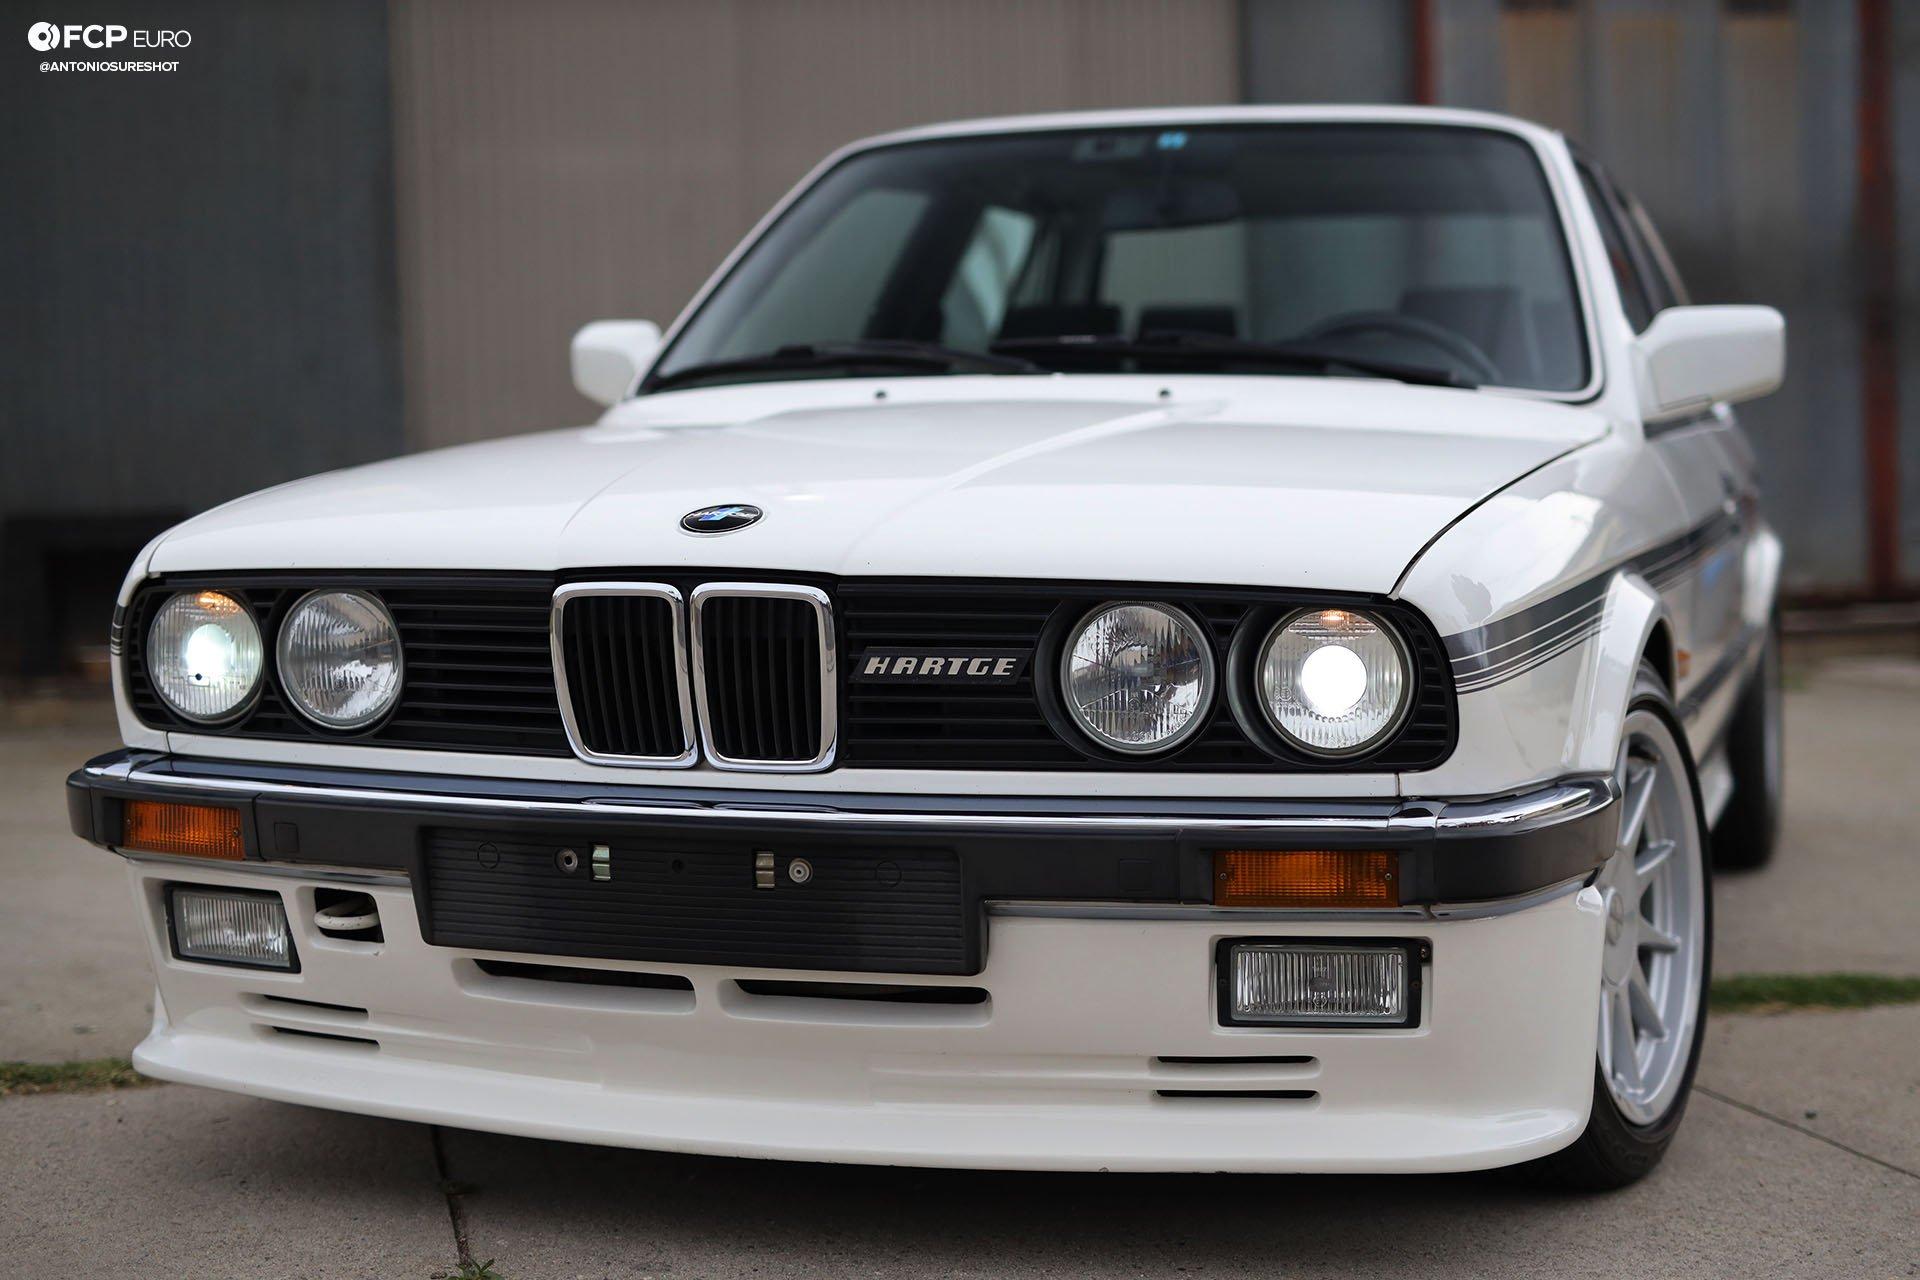 E30 BMW Hartge H26 Front 3/4